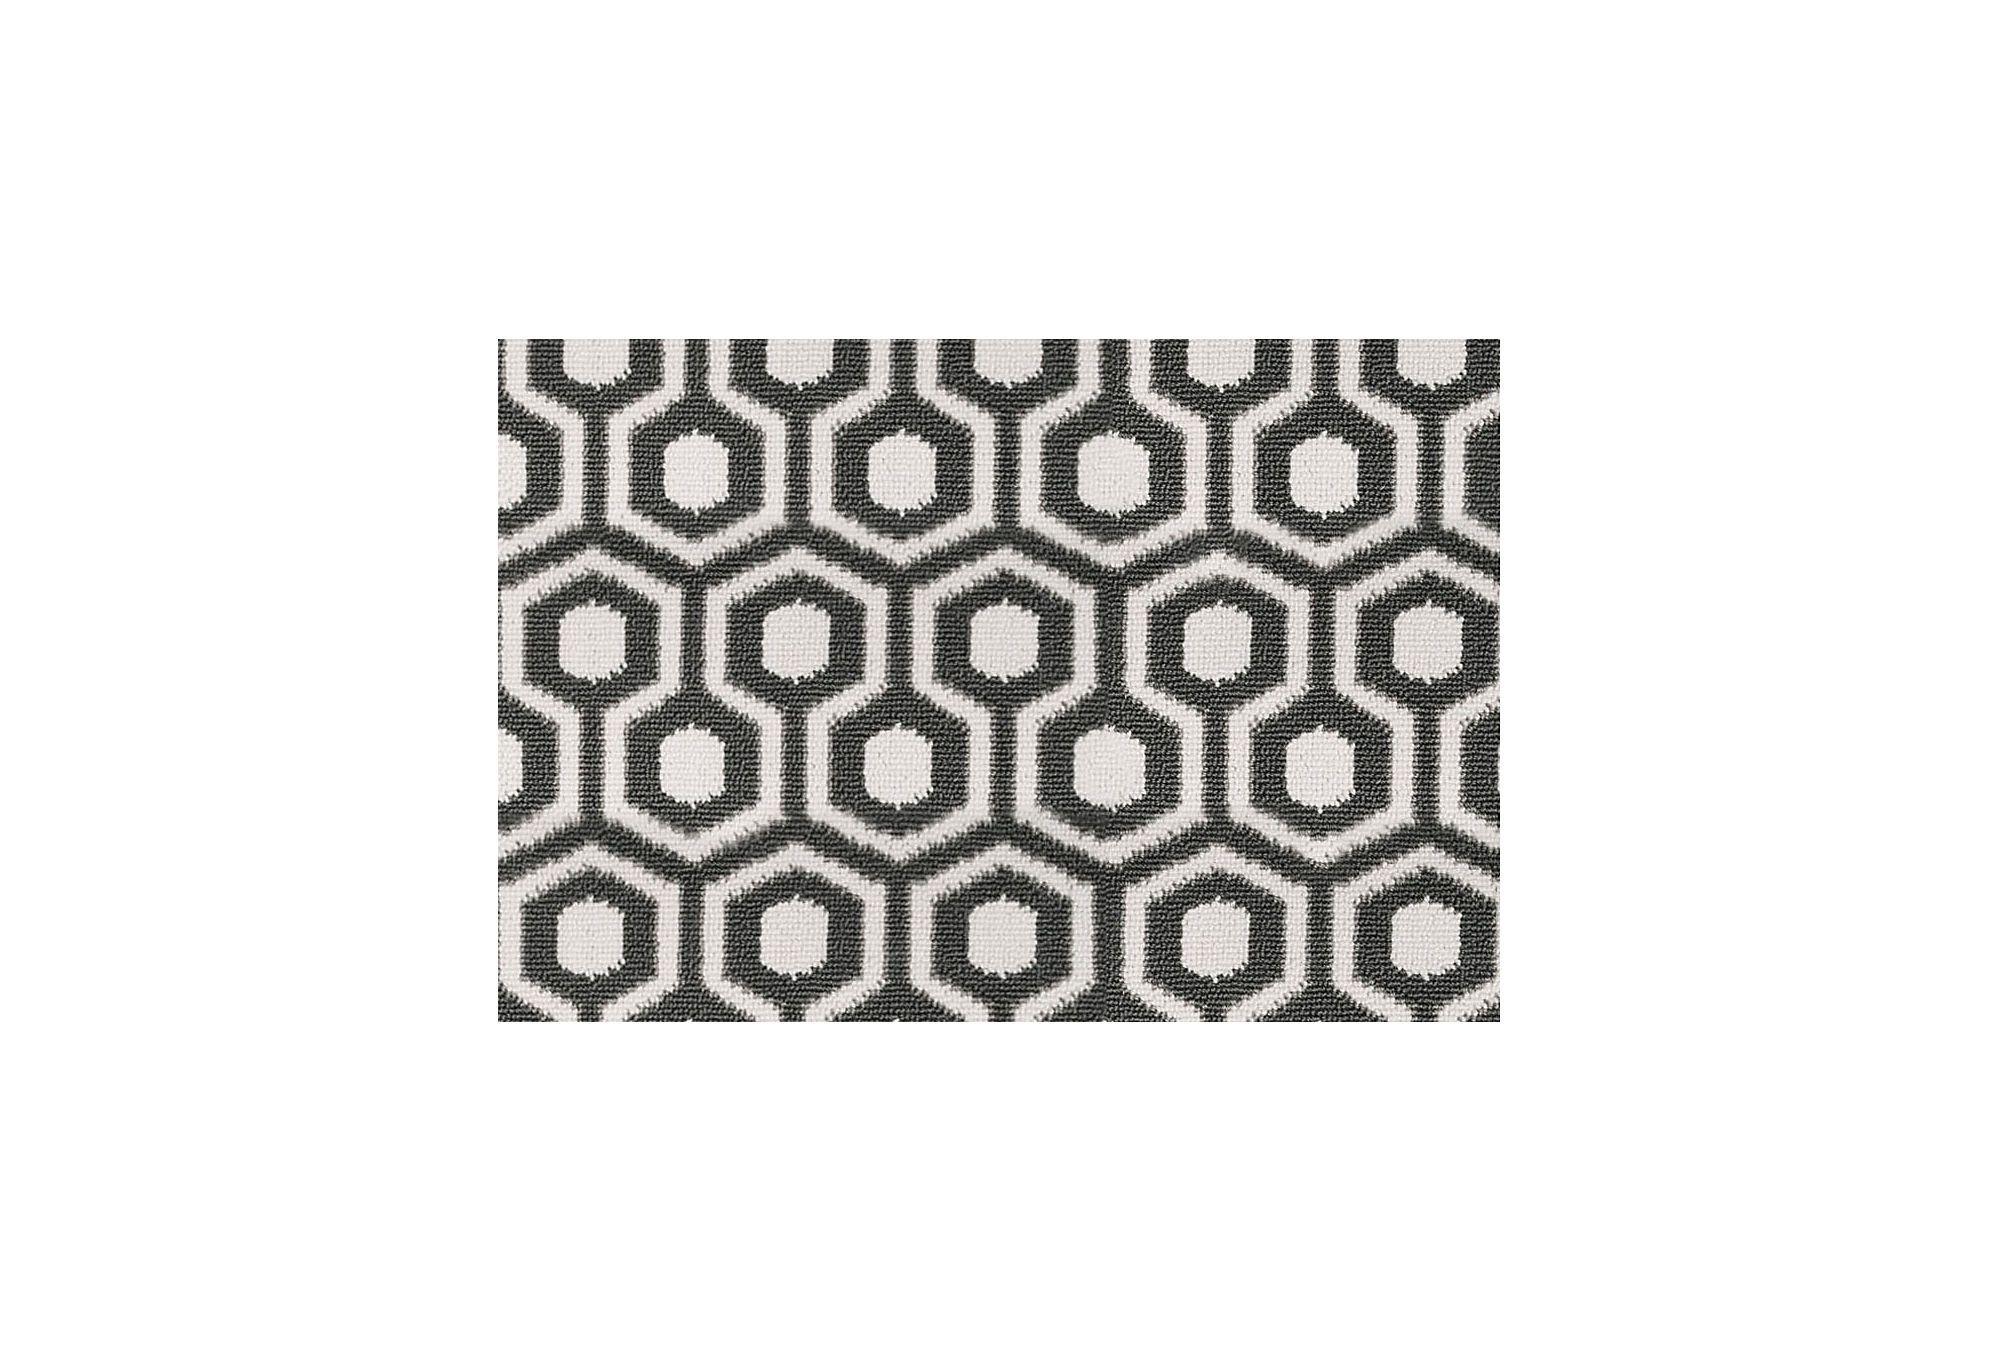 Papier Peint David Hicks david hicks hexagon rug, charcoal/gray | pattern play